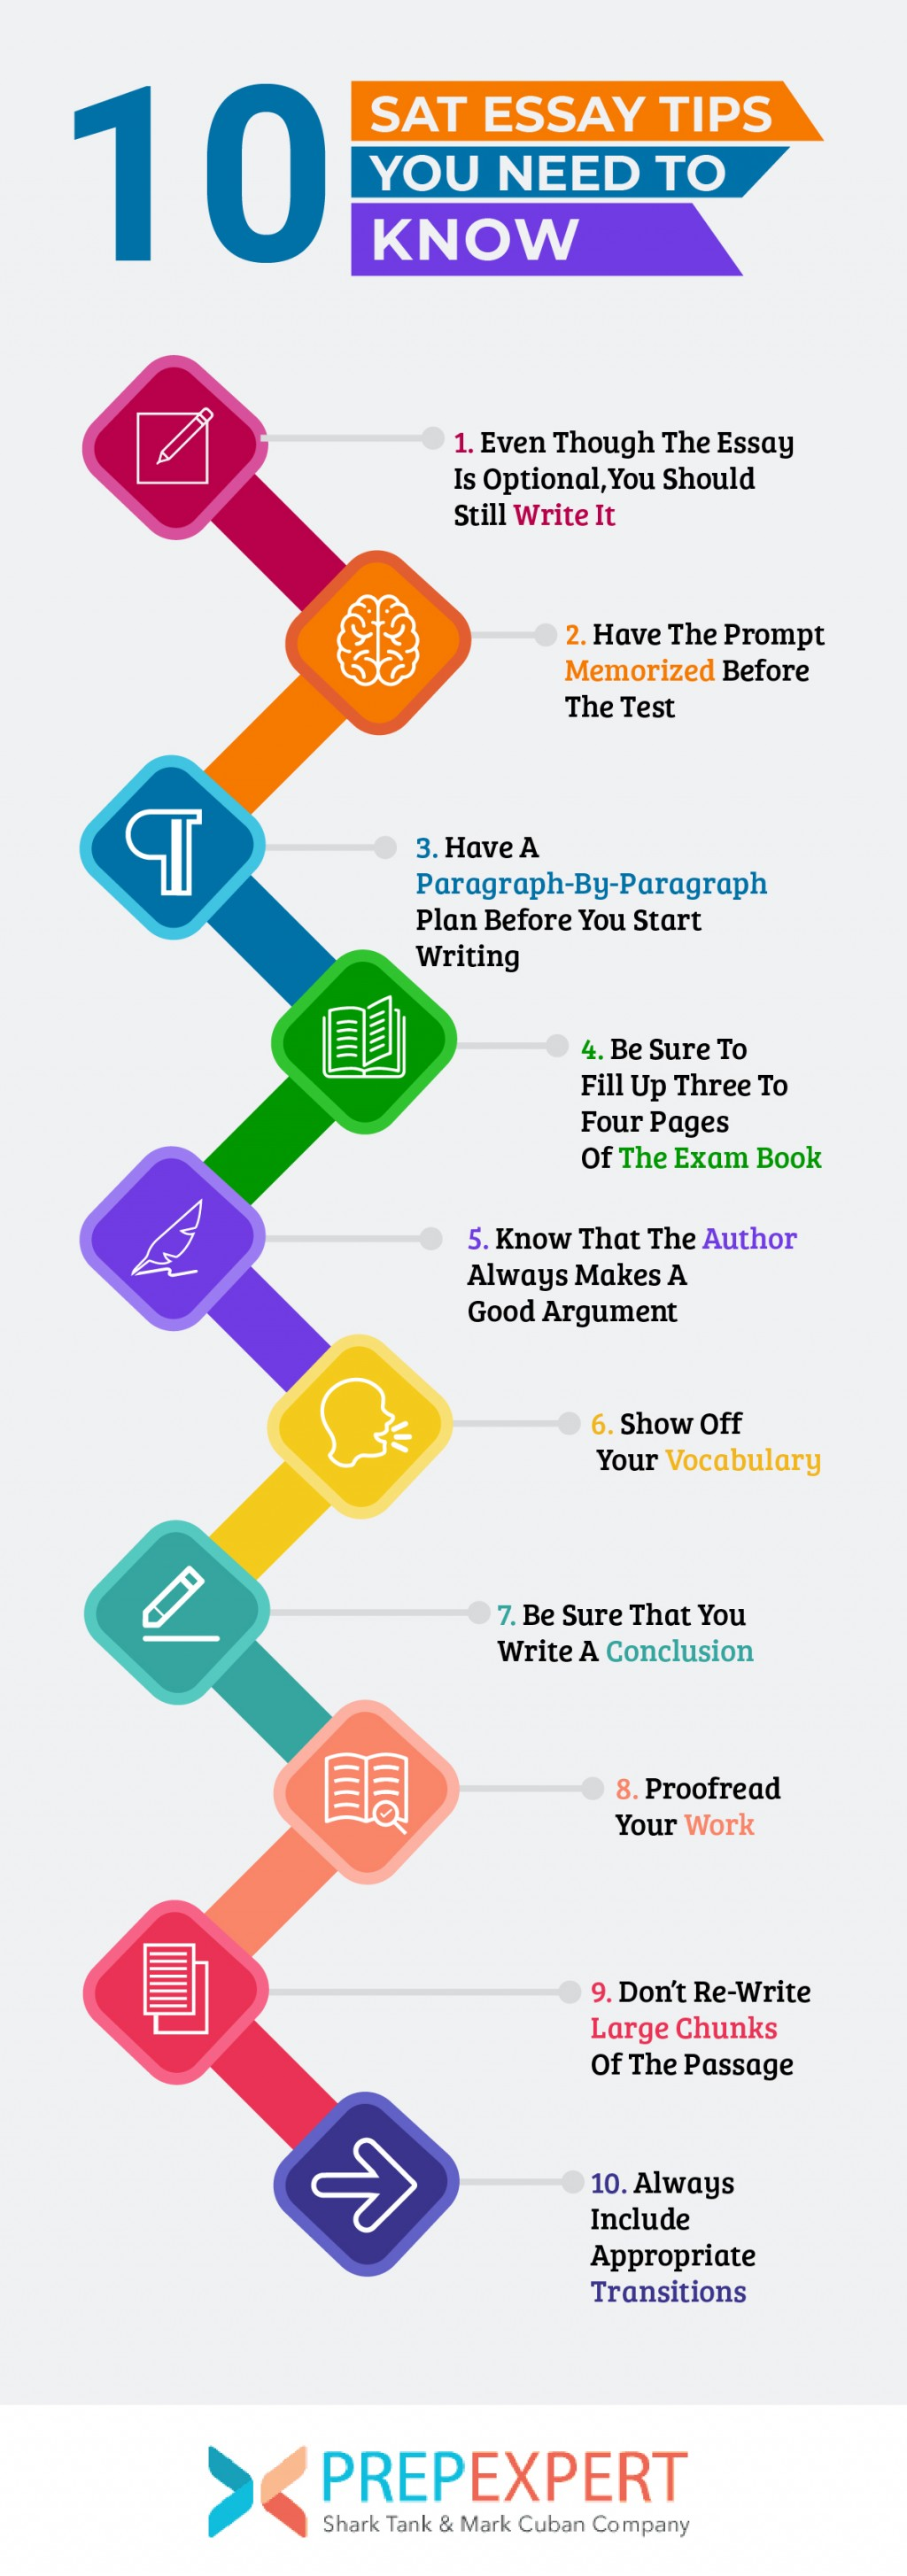 001 239645 Essaytips 060618 Sat Essay Tips Singular Pdf Writing Prepscholar Large